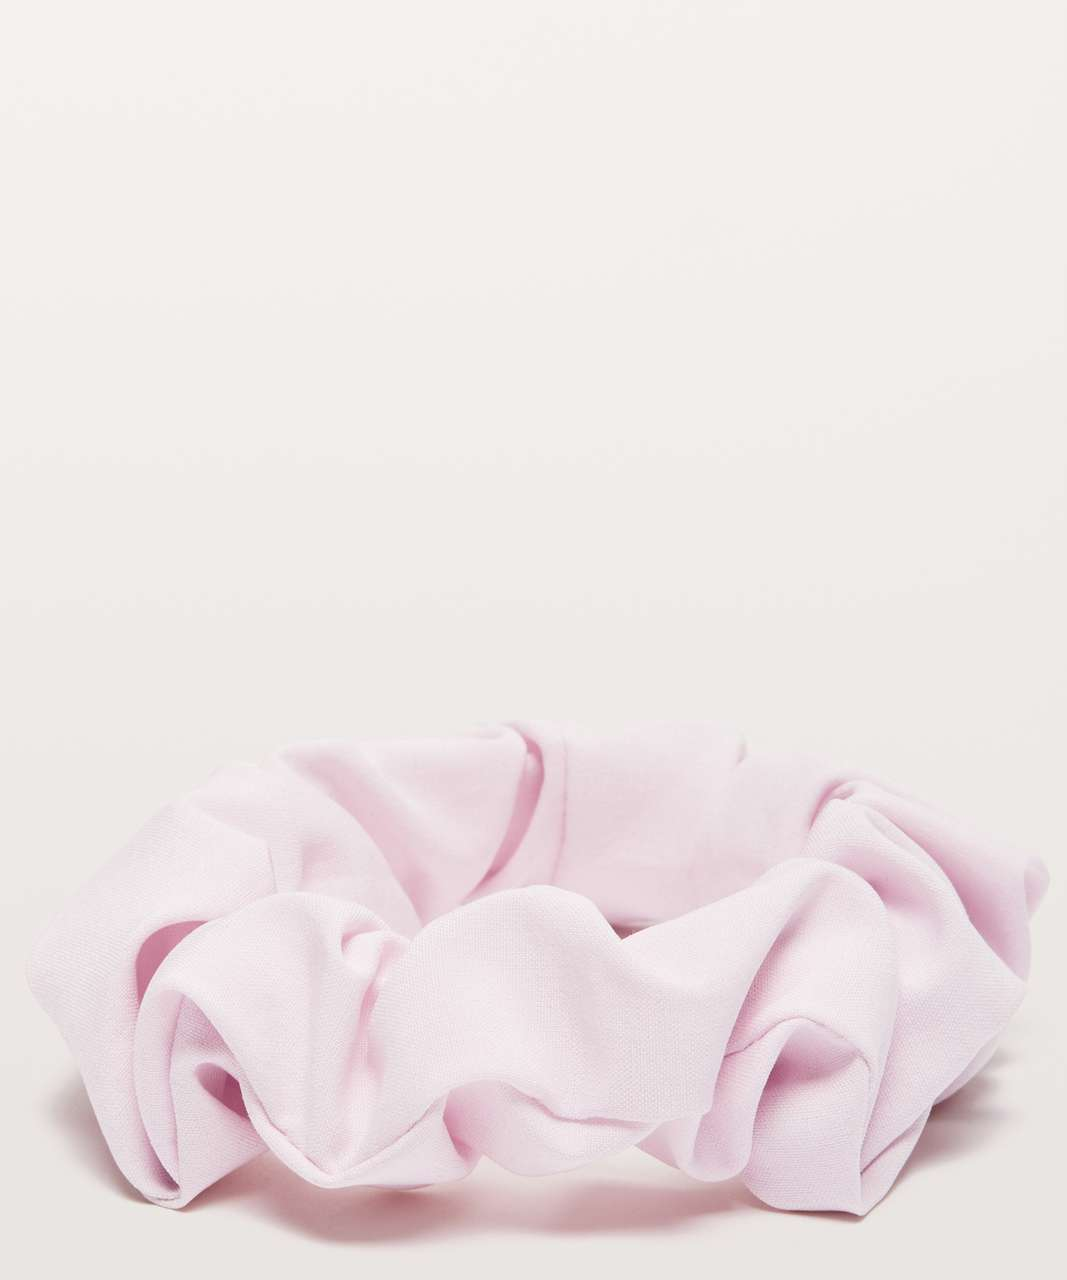 Lululemon Uplifting Scrunchie - Blissful Pink